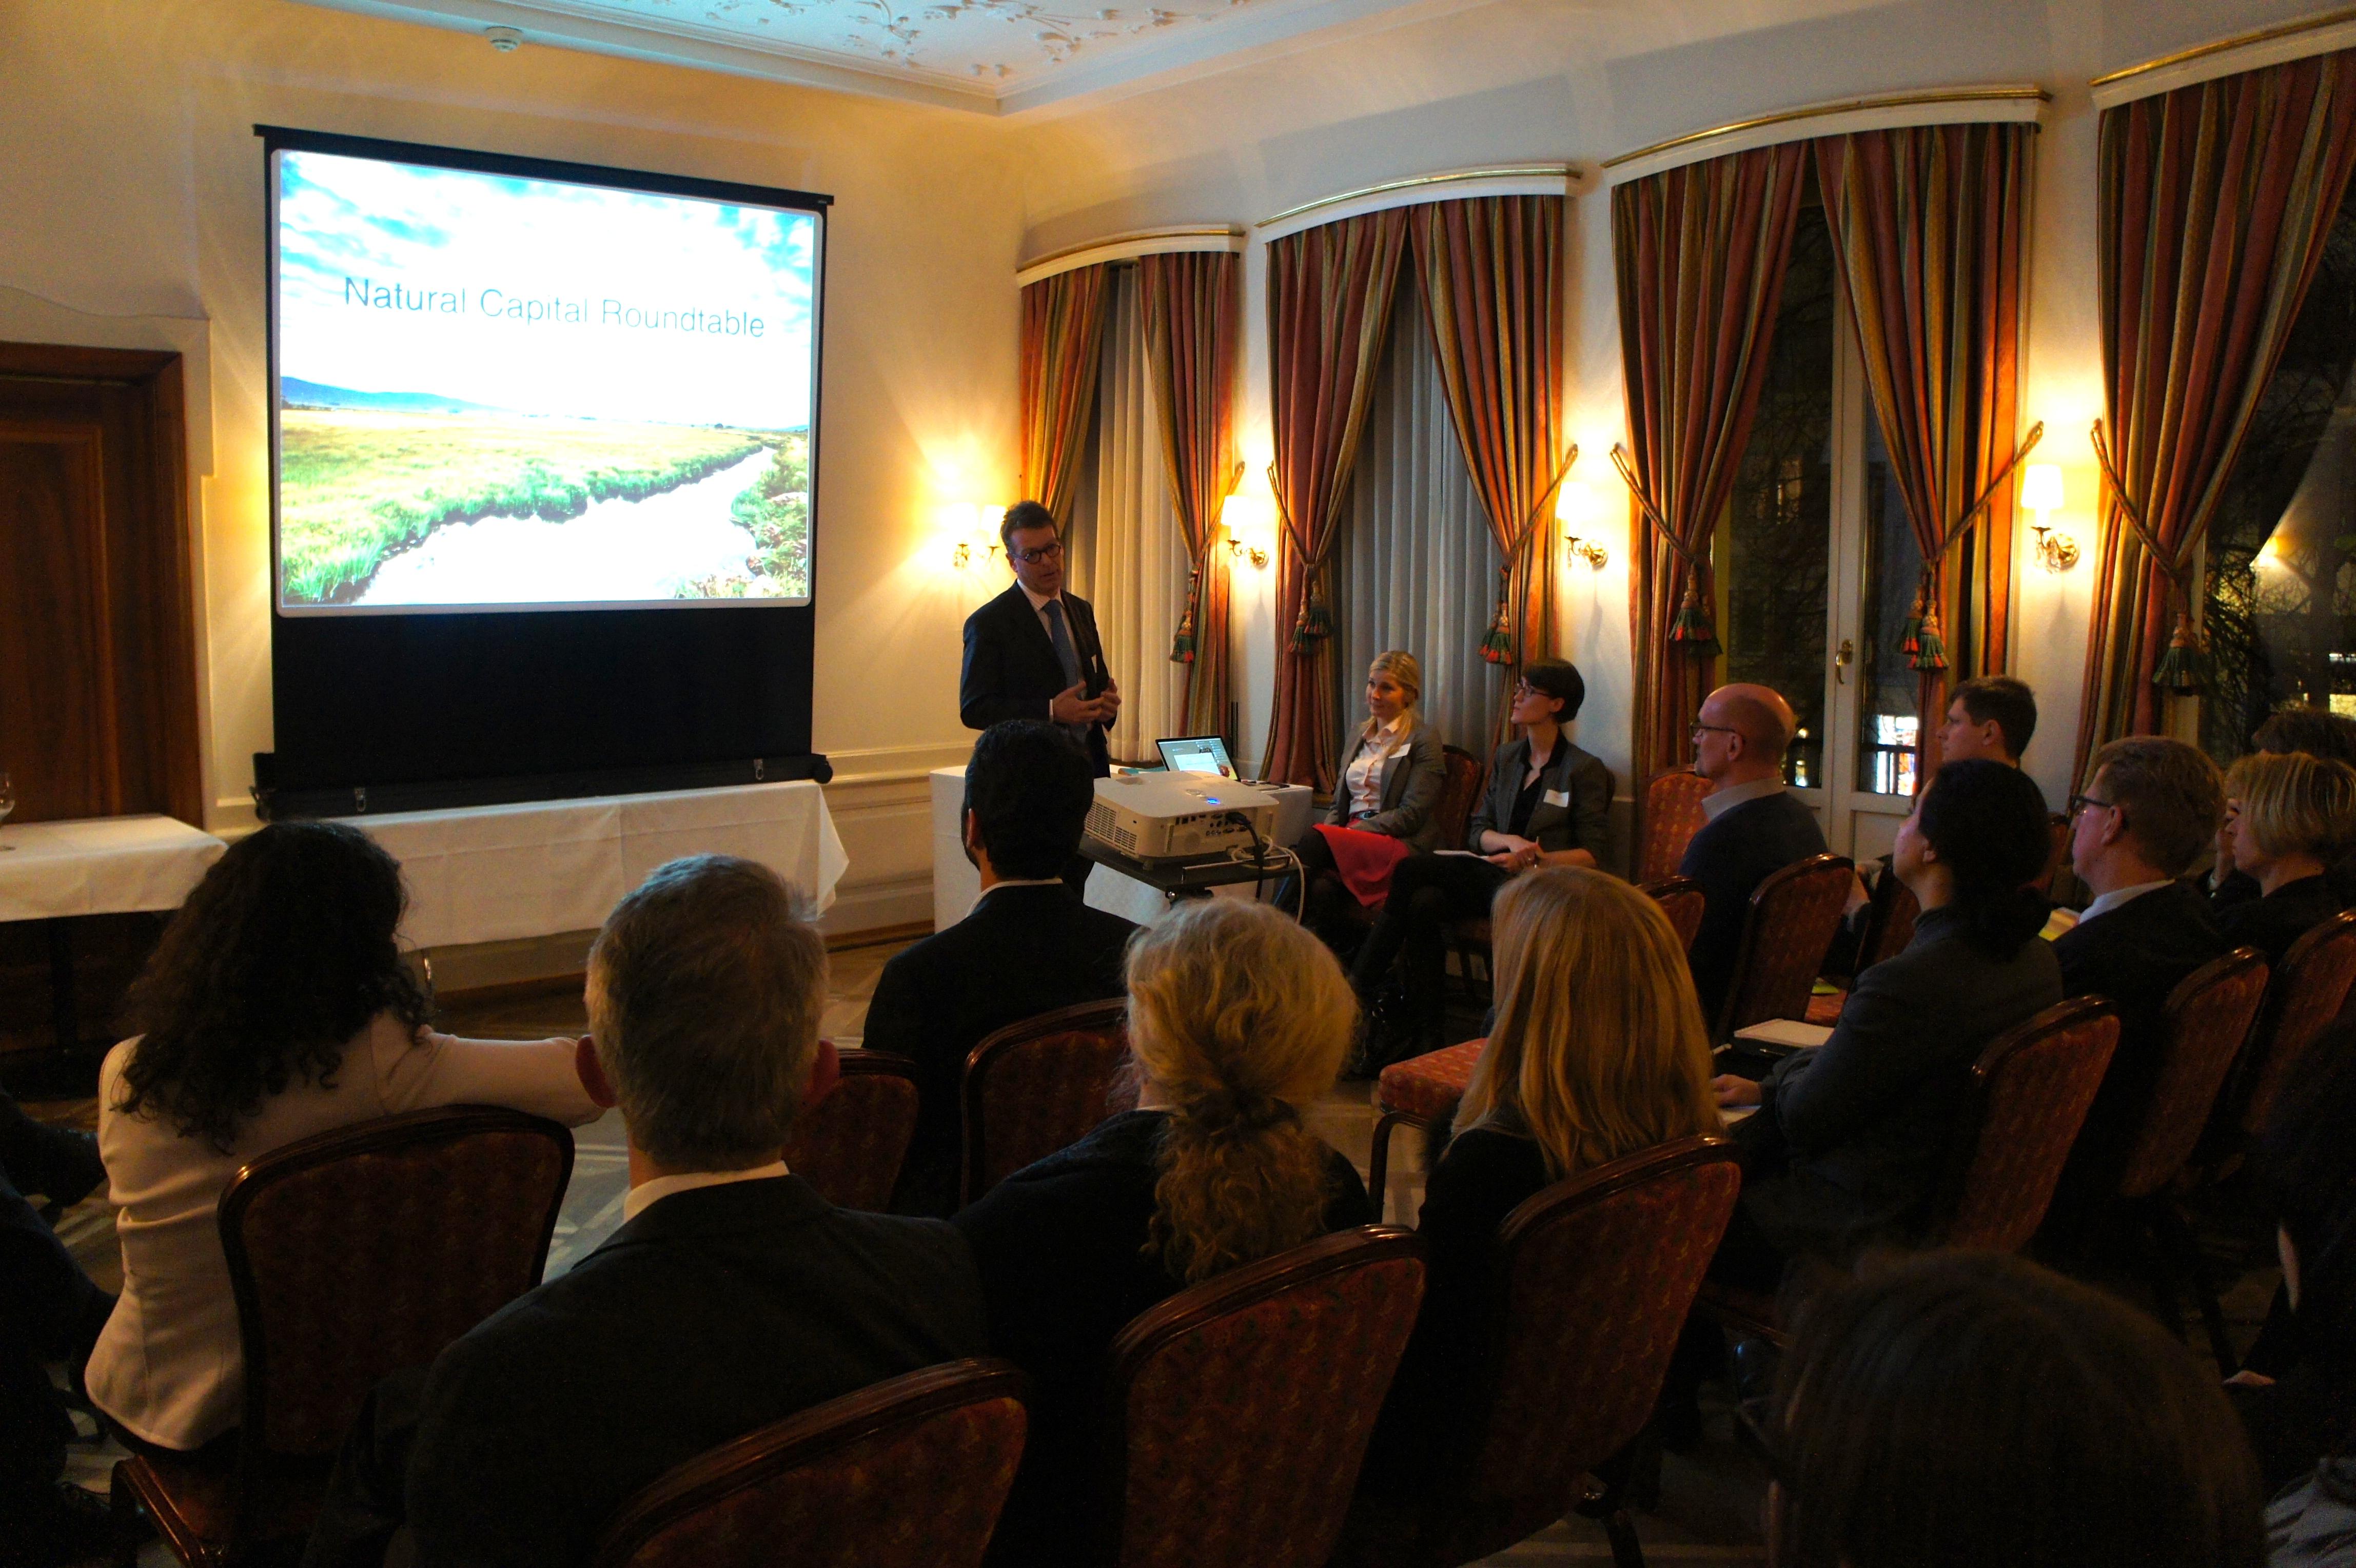 David Bresch giving an overview of Swiss Re's approach to Natural Capital